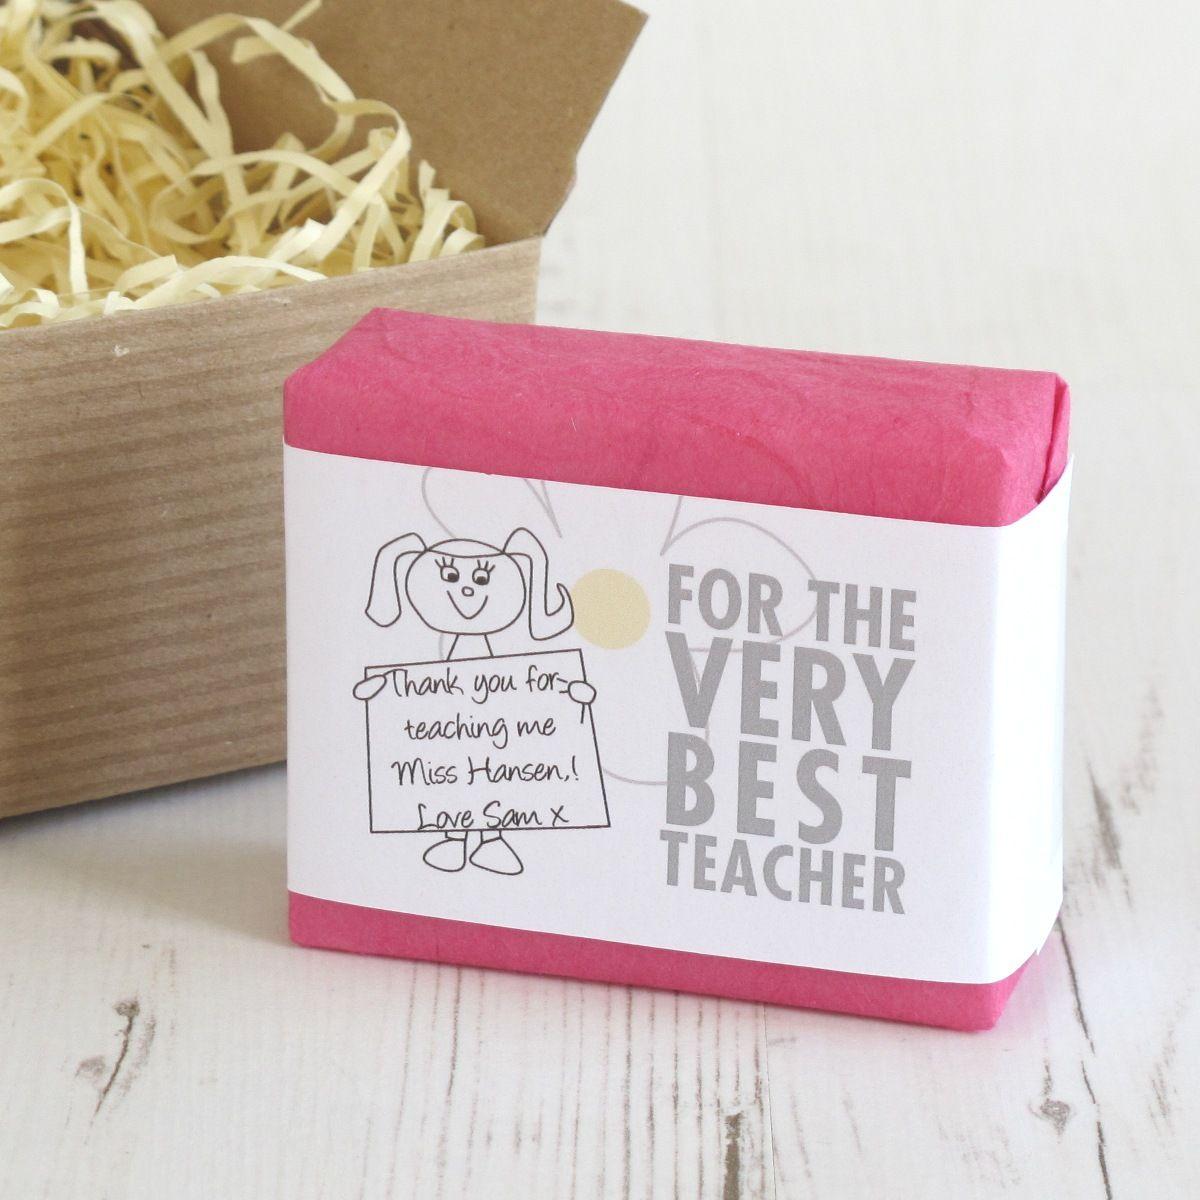 teacher thank you gifts, graduation gifts